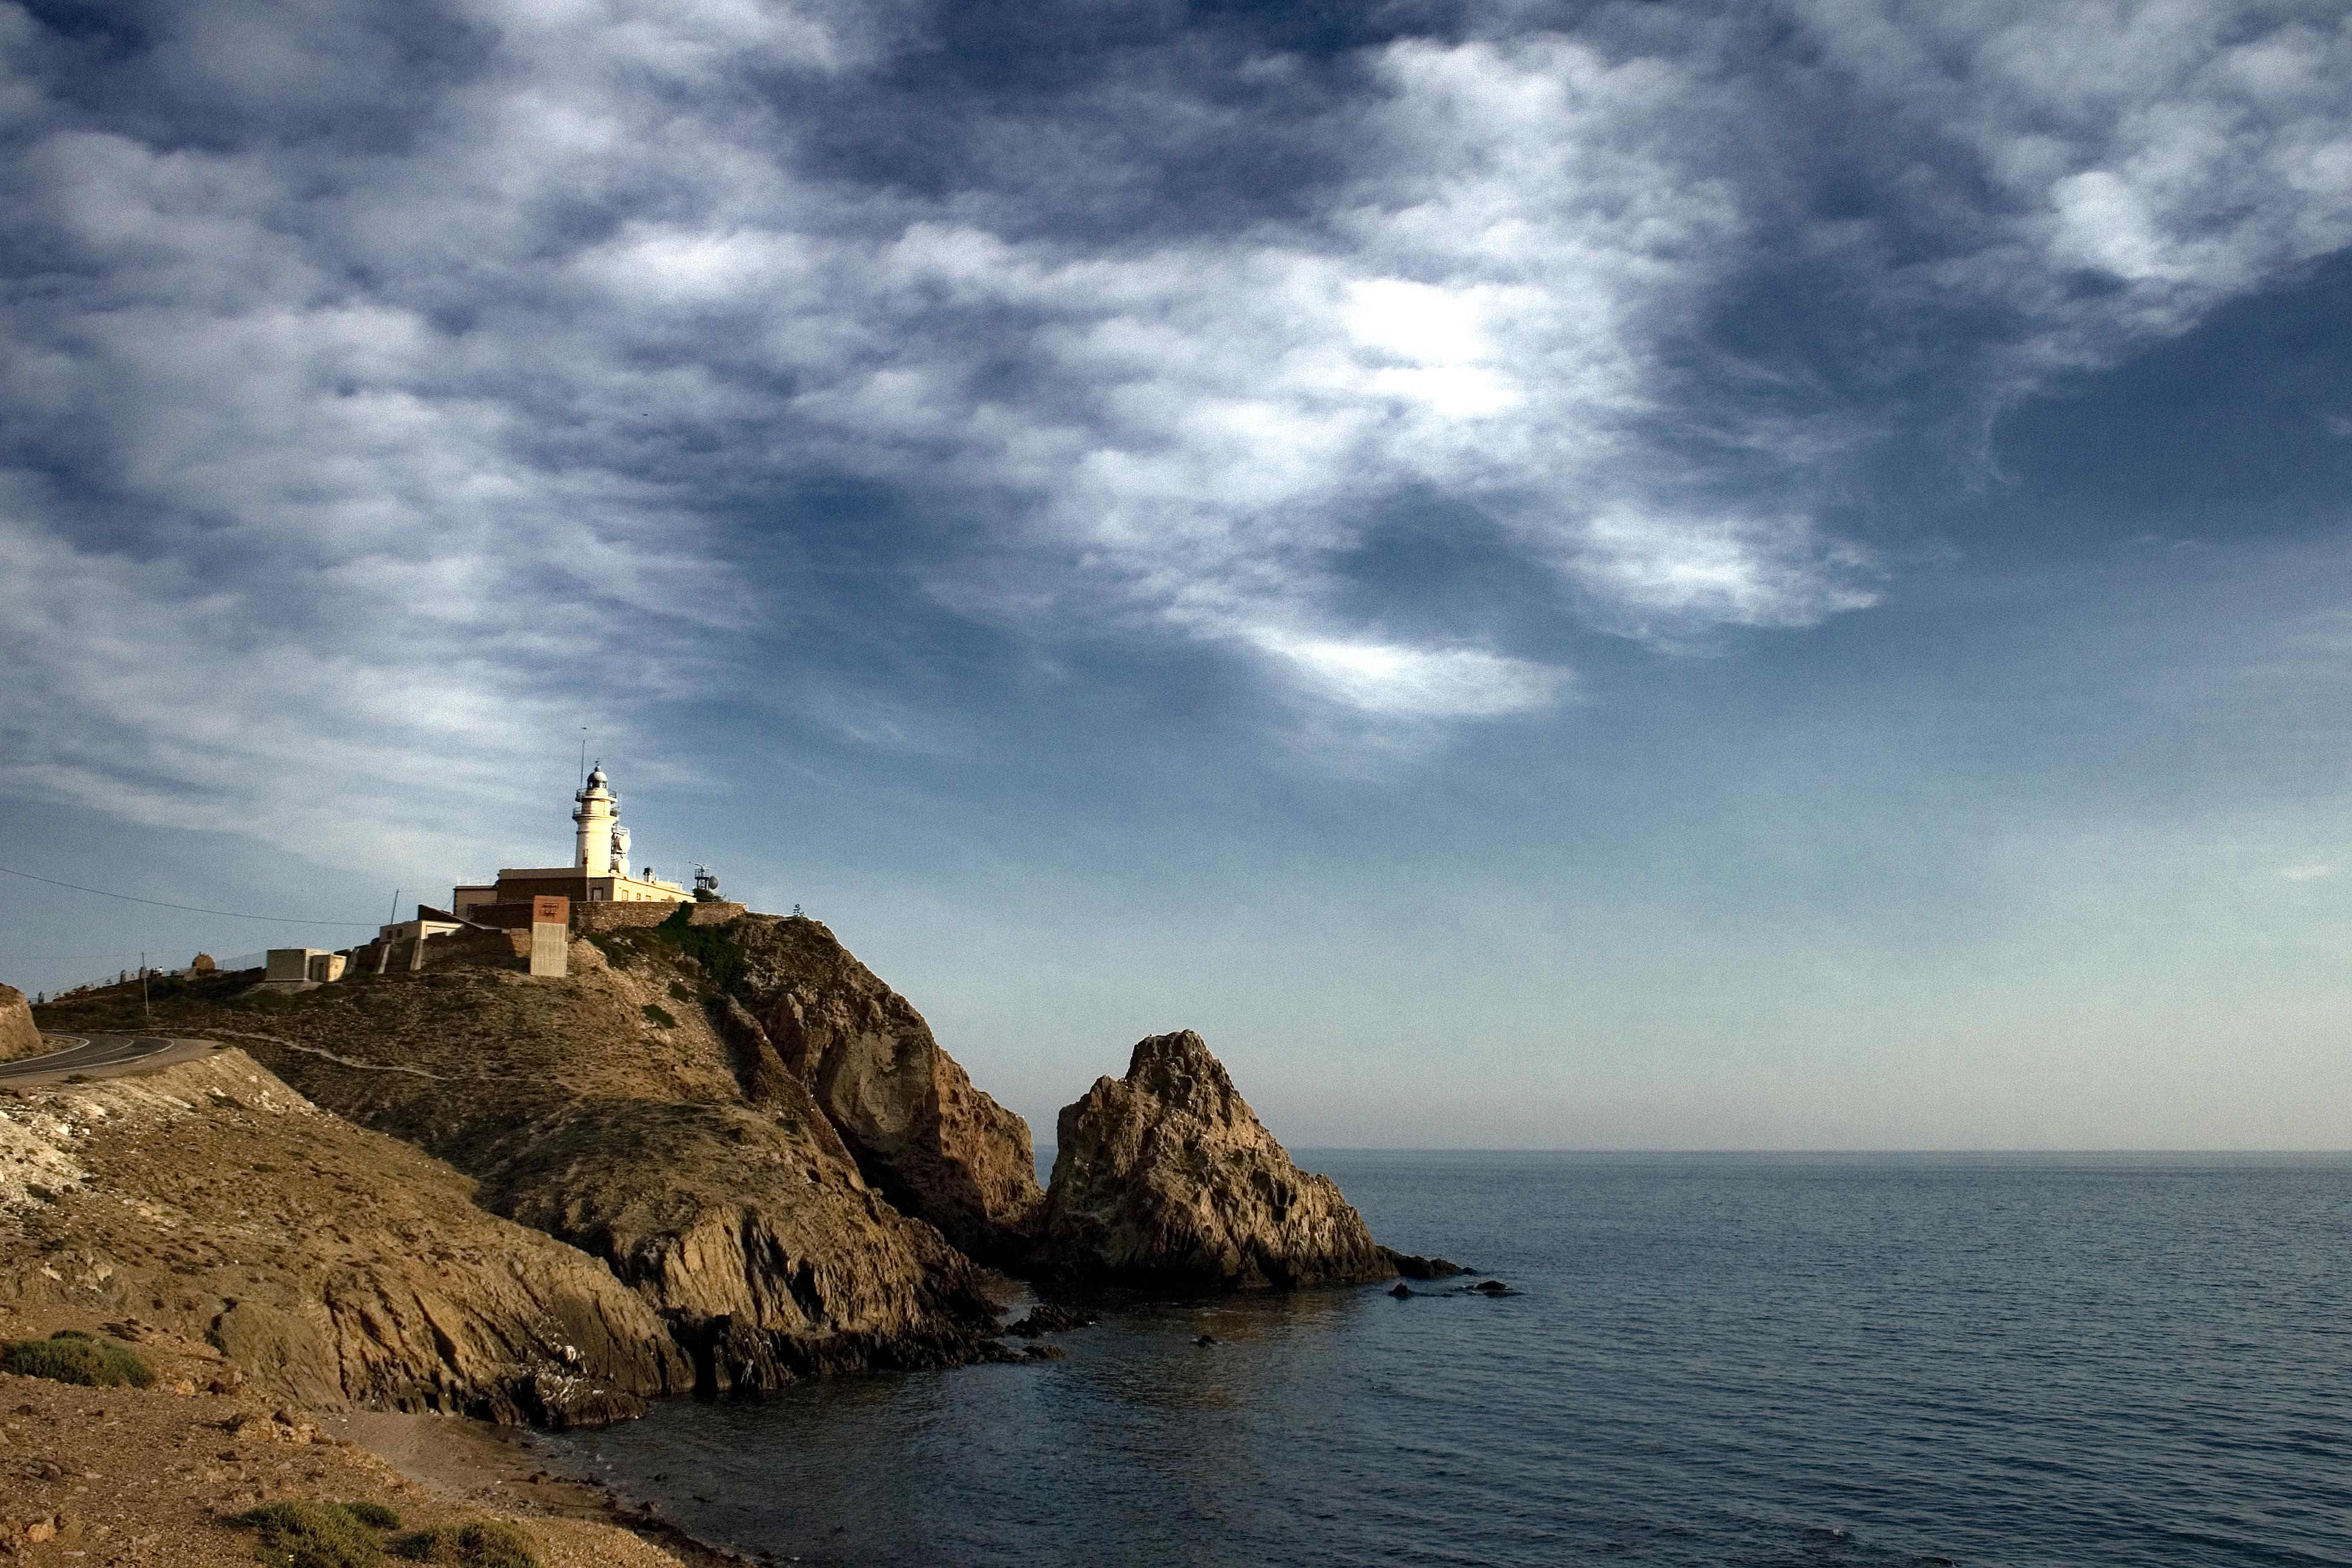 Faro del cabo de gata almer a spain flickr photo for Cabo de gata spain